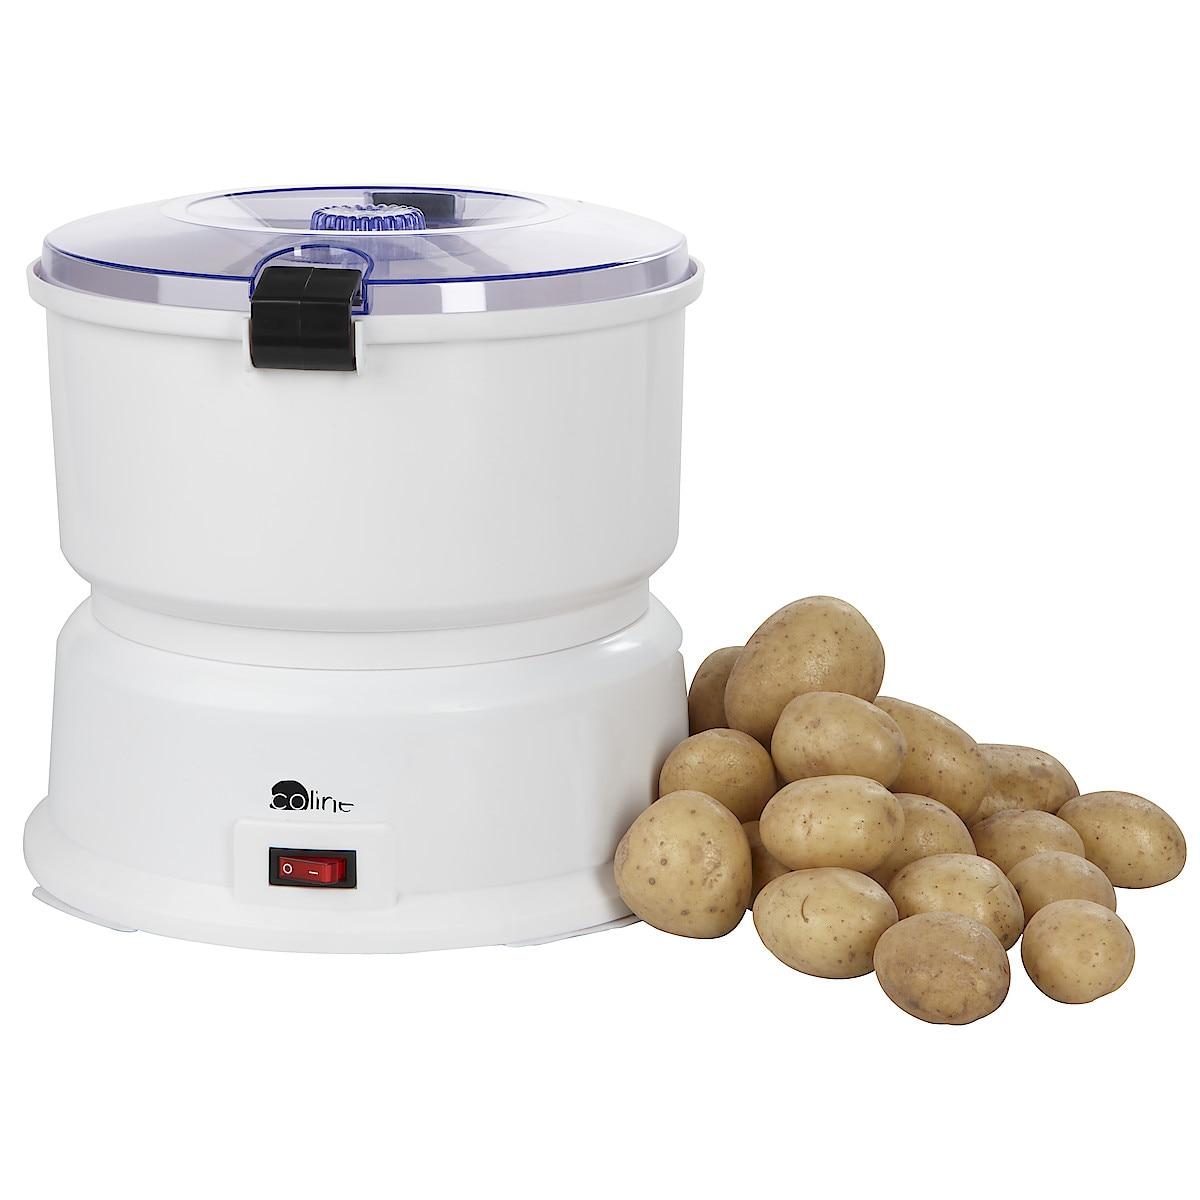 Coline Potato Peeler